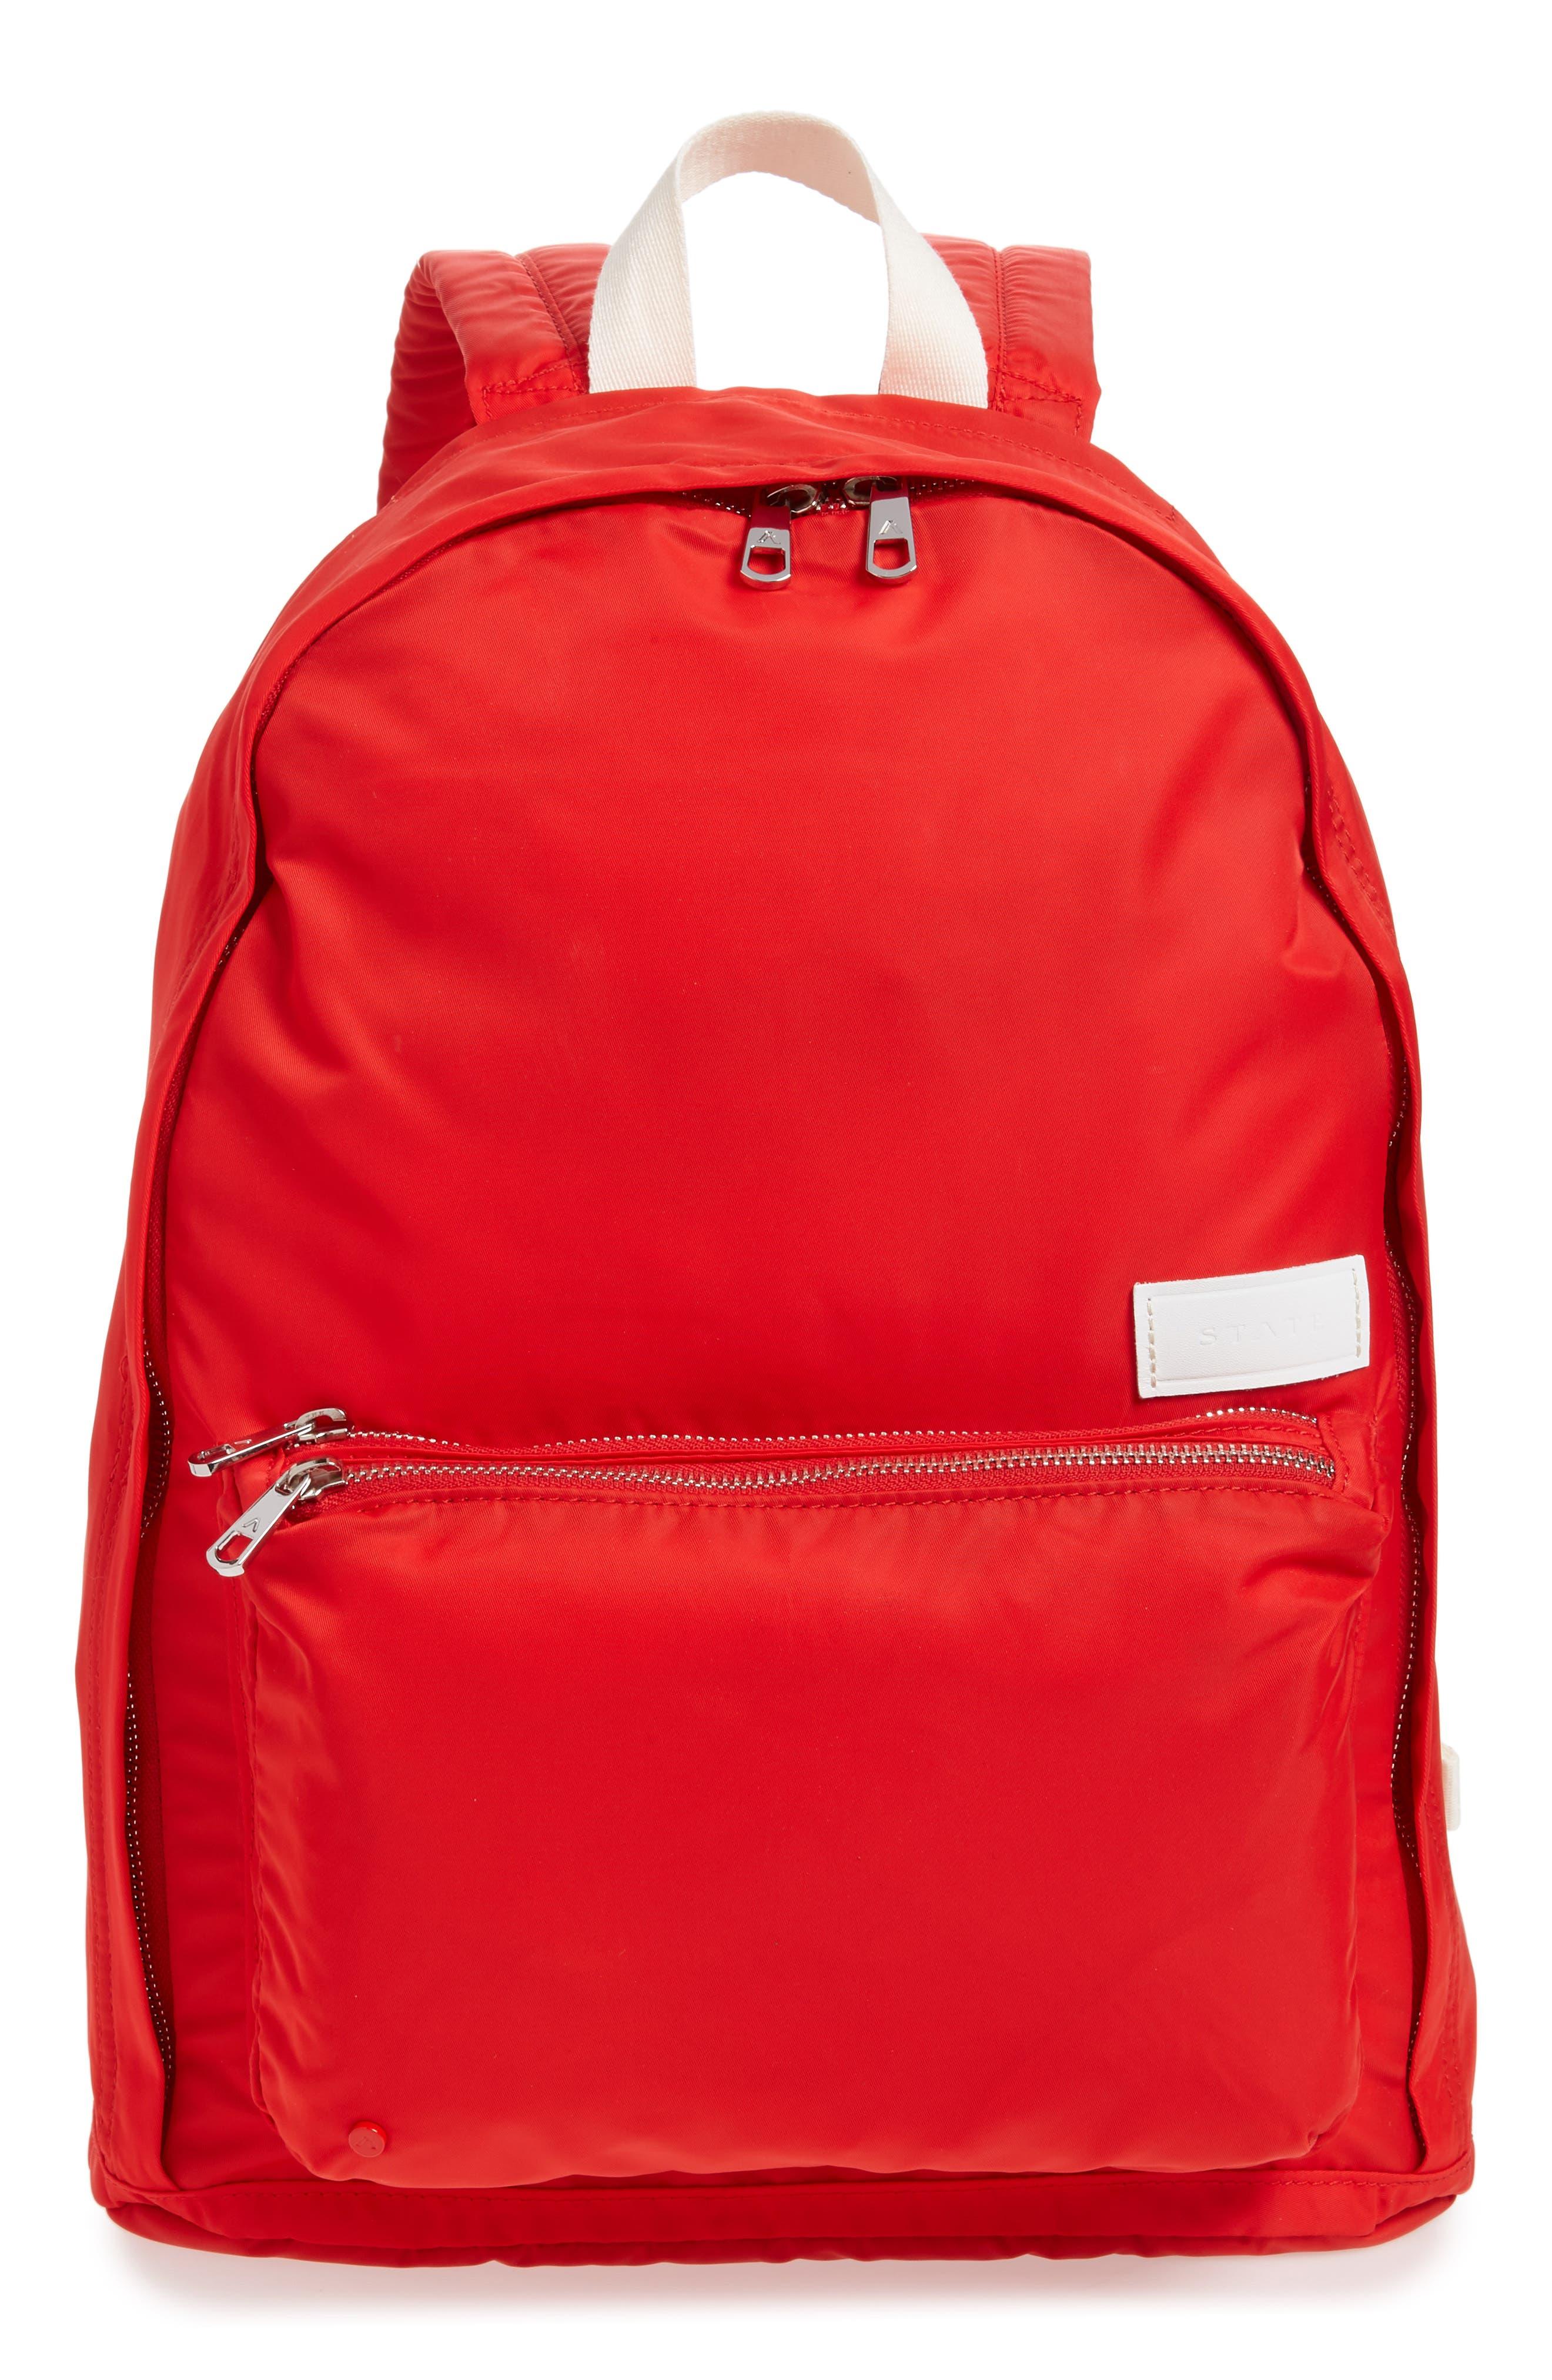 Heights Lorimer Nylon Backpack,                             Main thumbnail 1, color,                             600